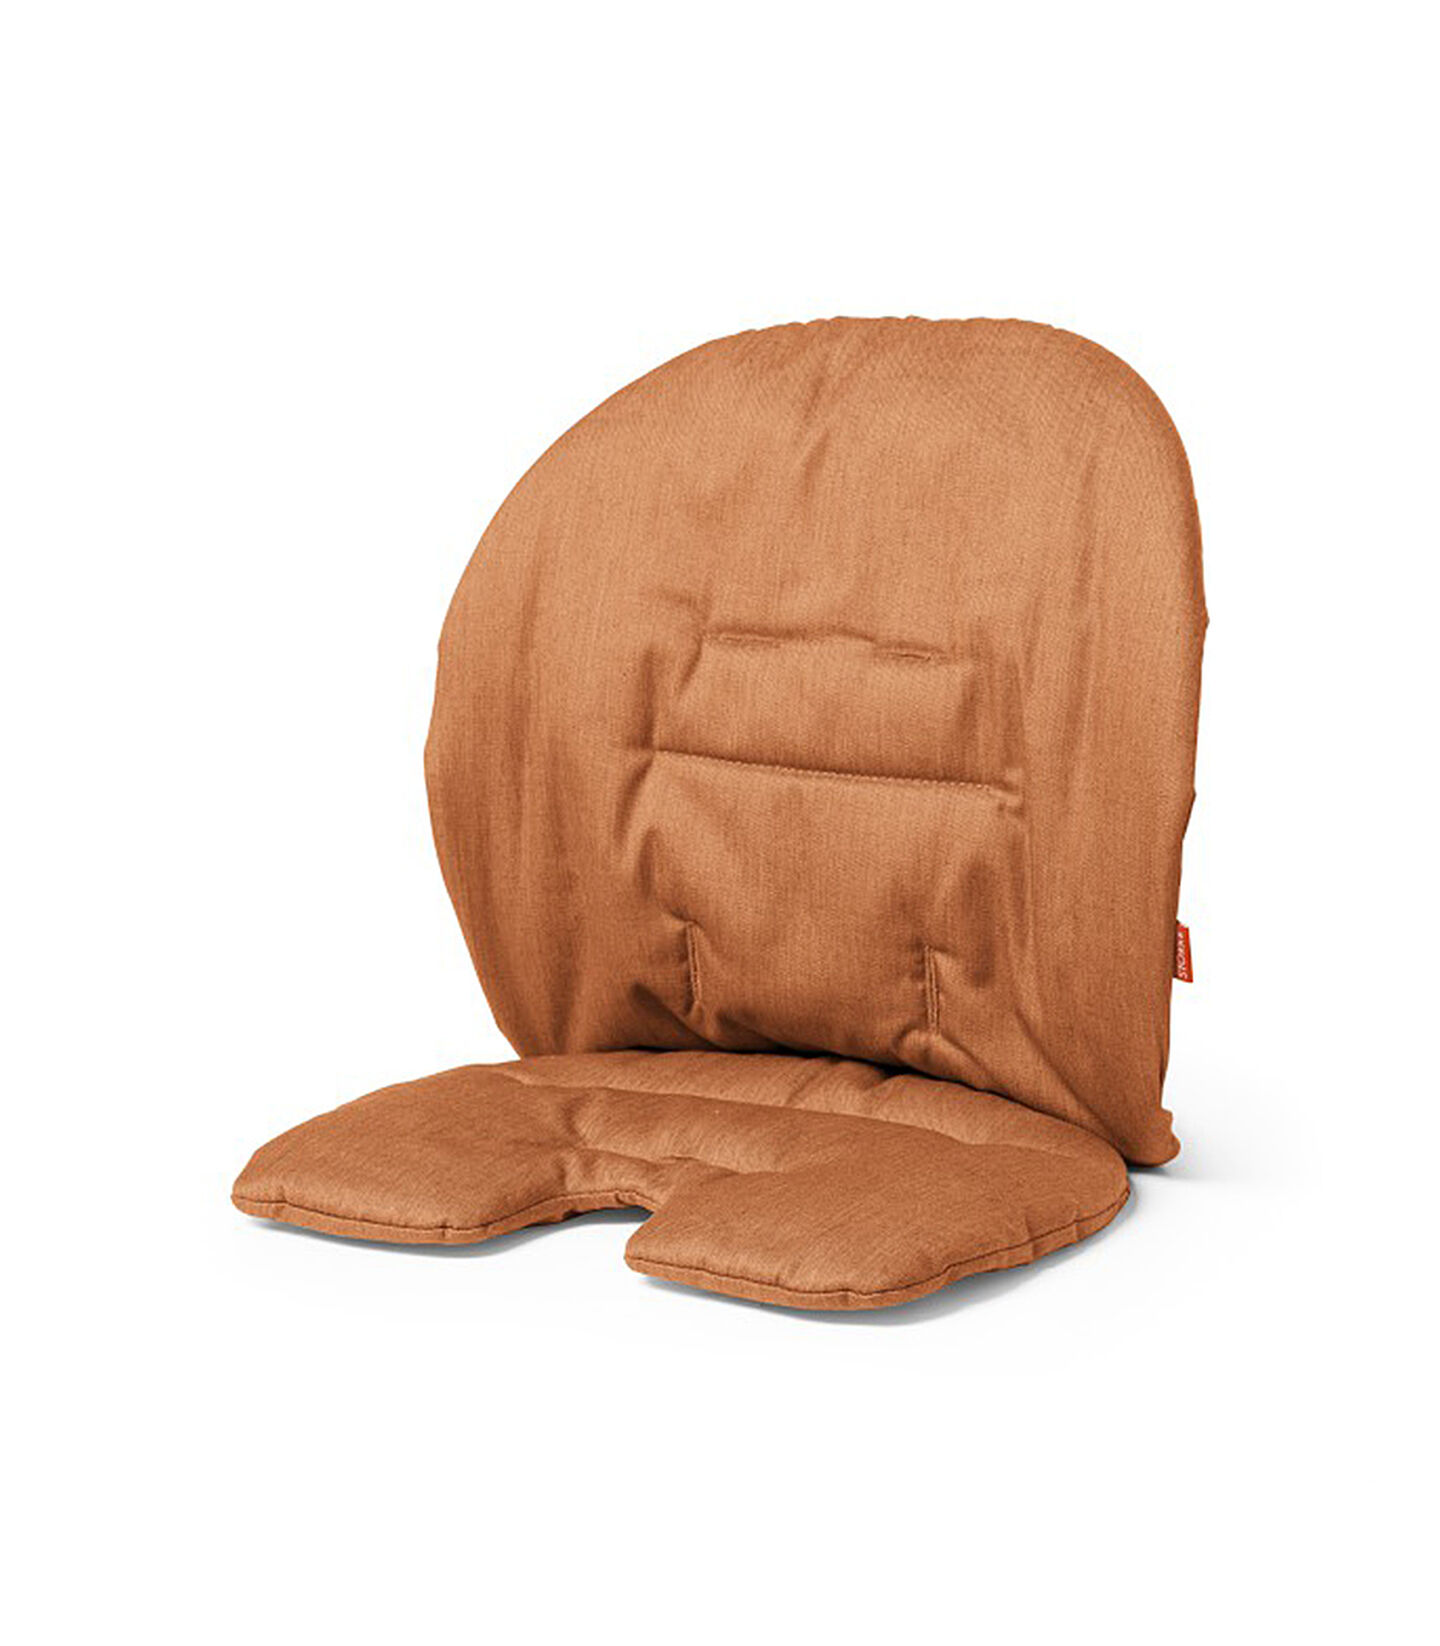 Stokke® Steps™ Cuscino per Baby Set Arancione, Arancione, mainview